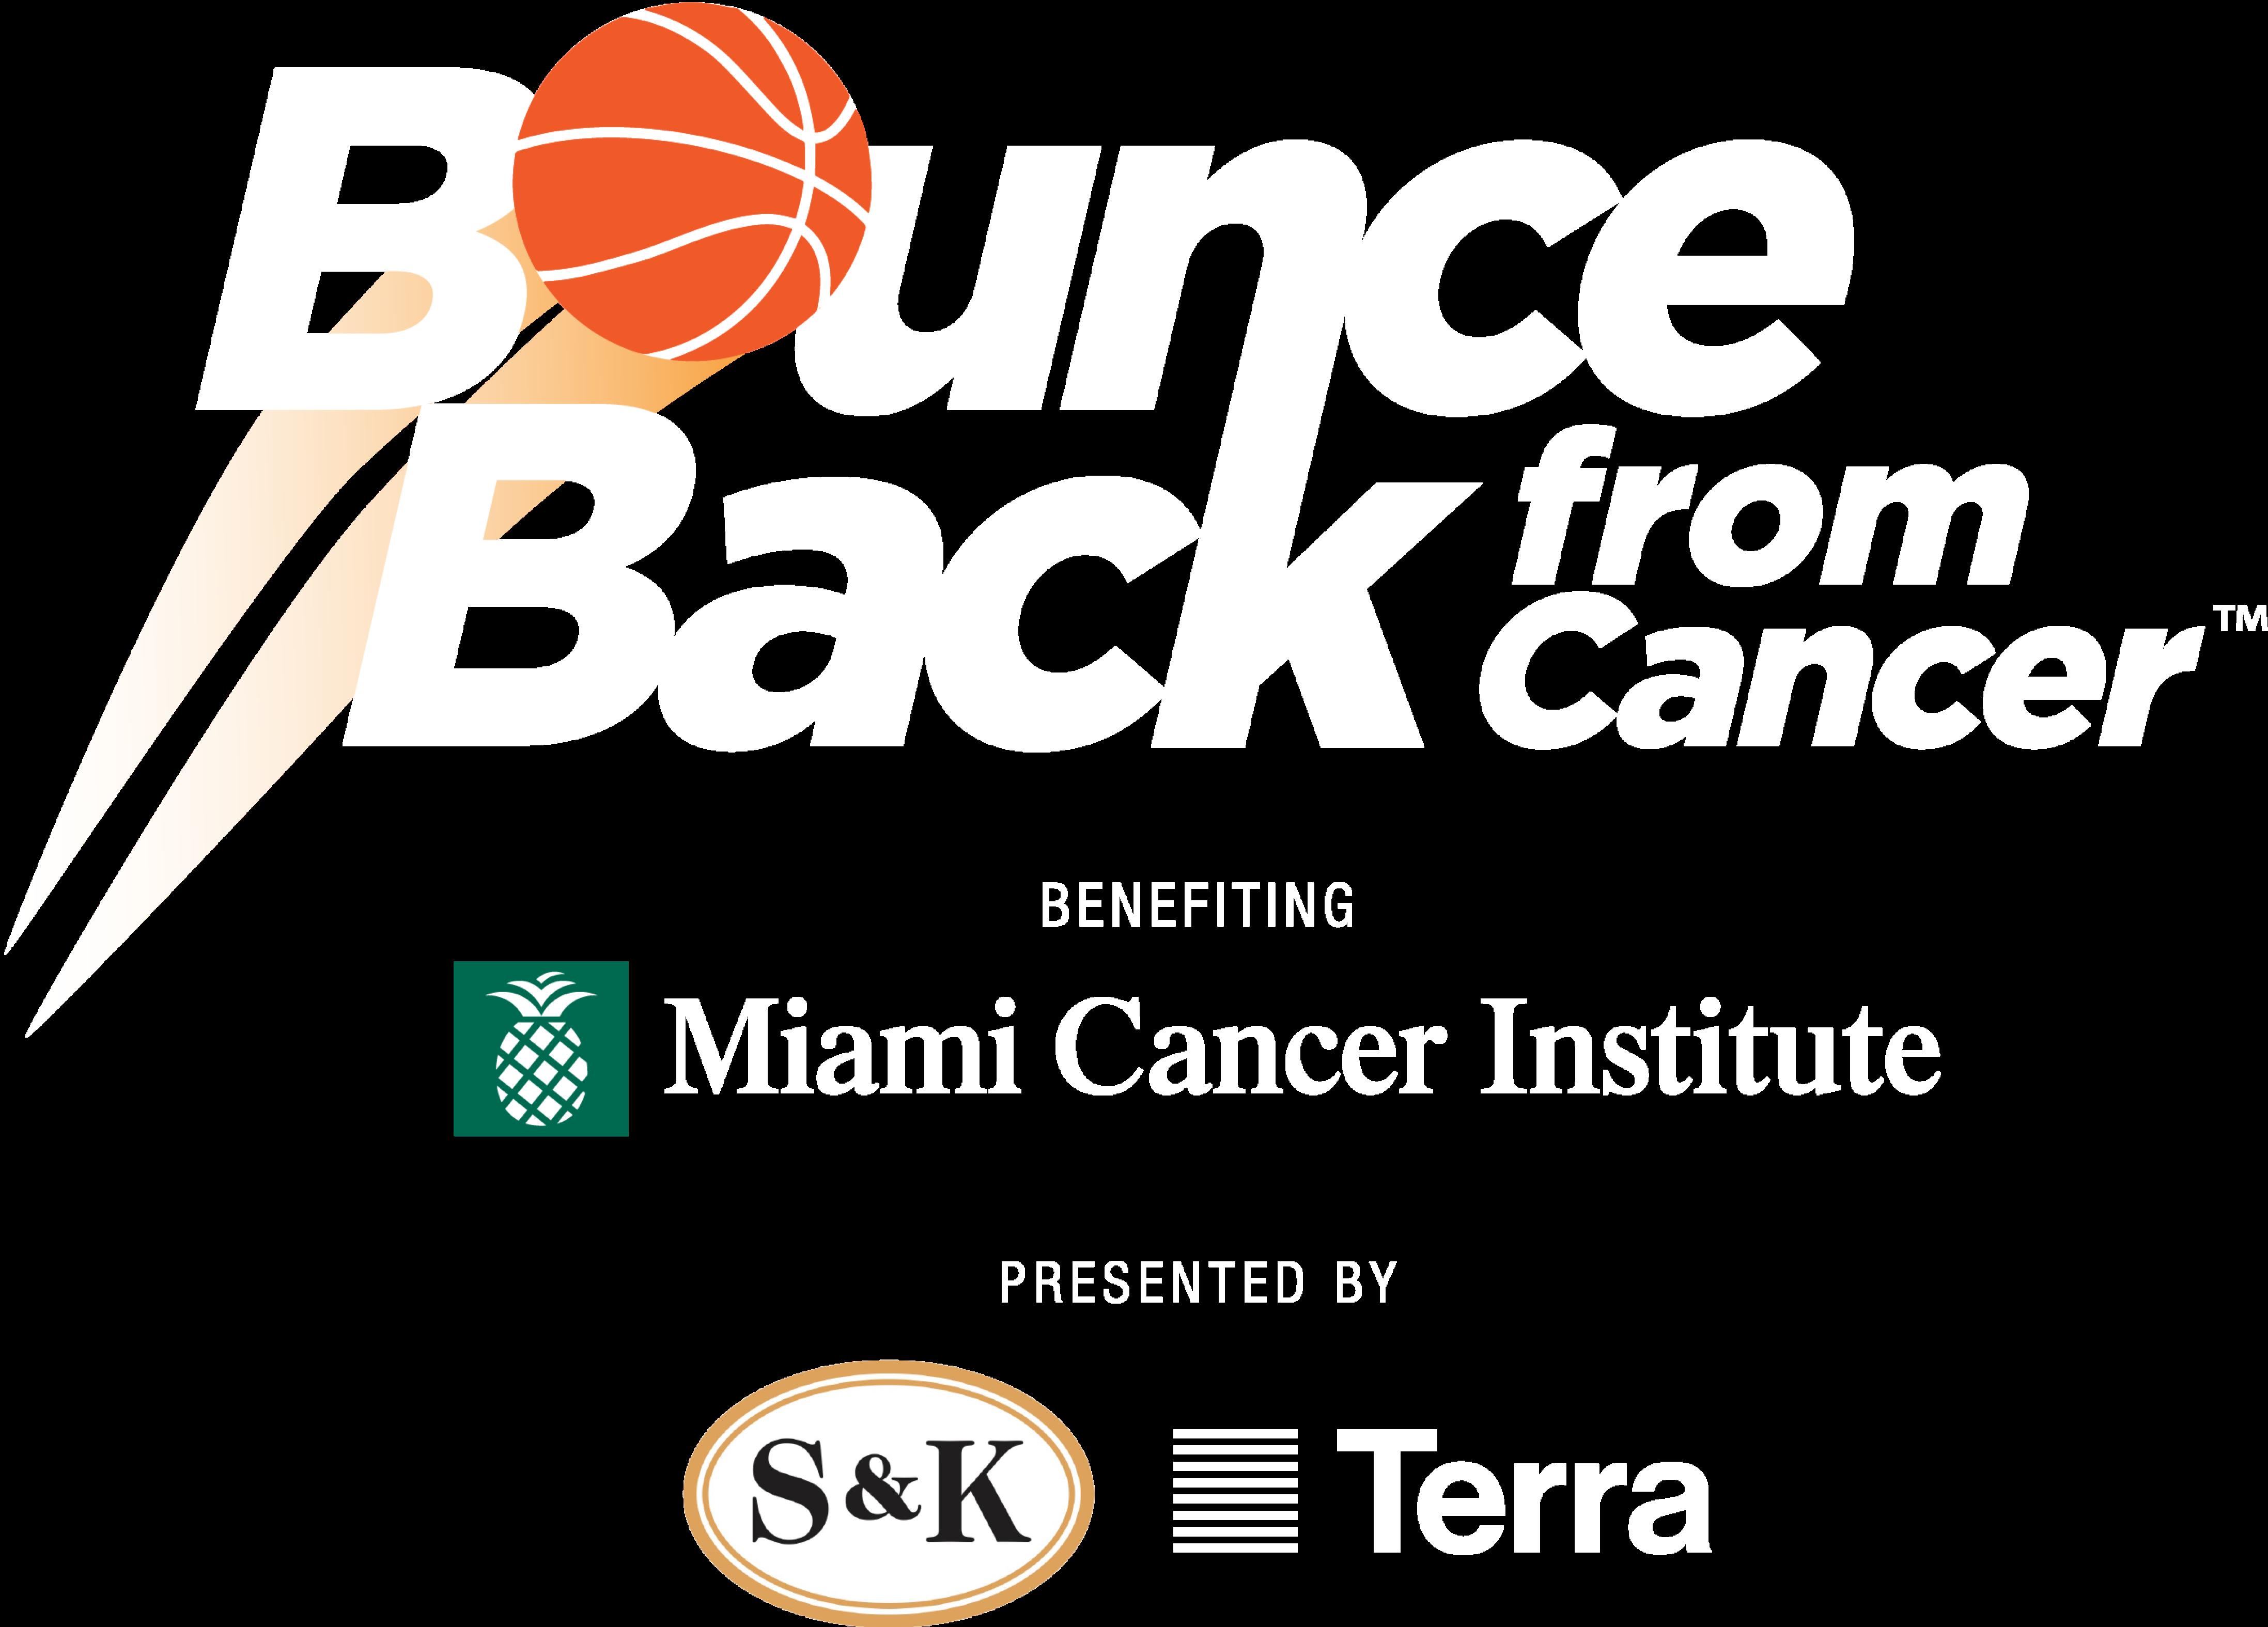 Bounce-back-logo-white